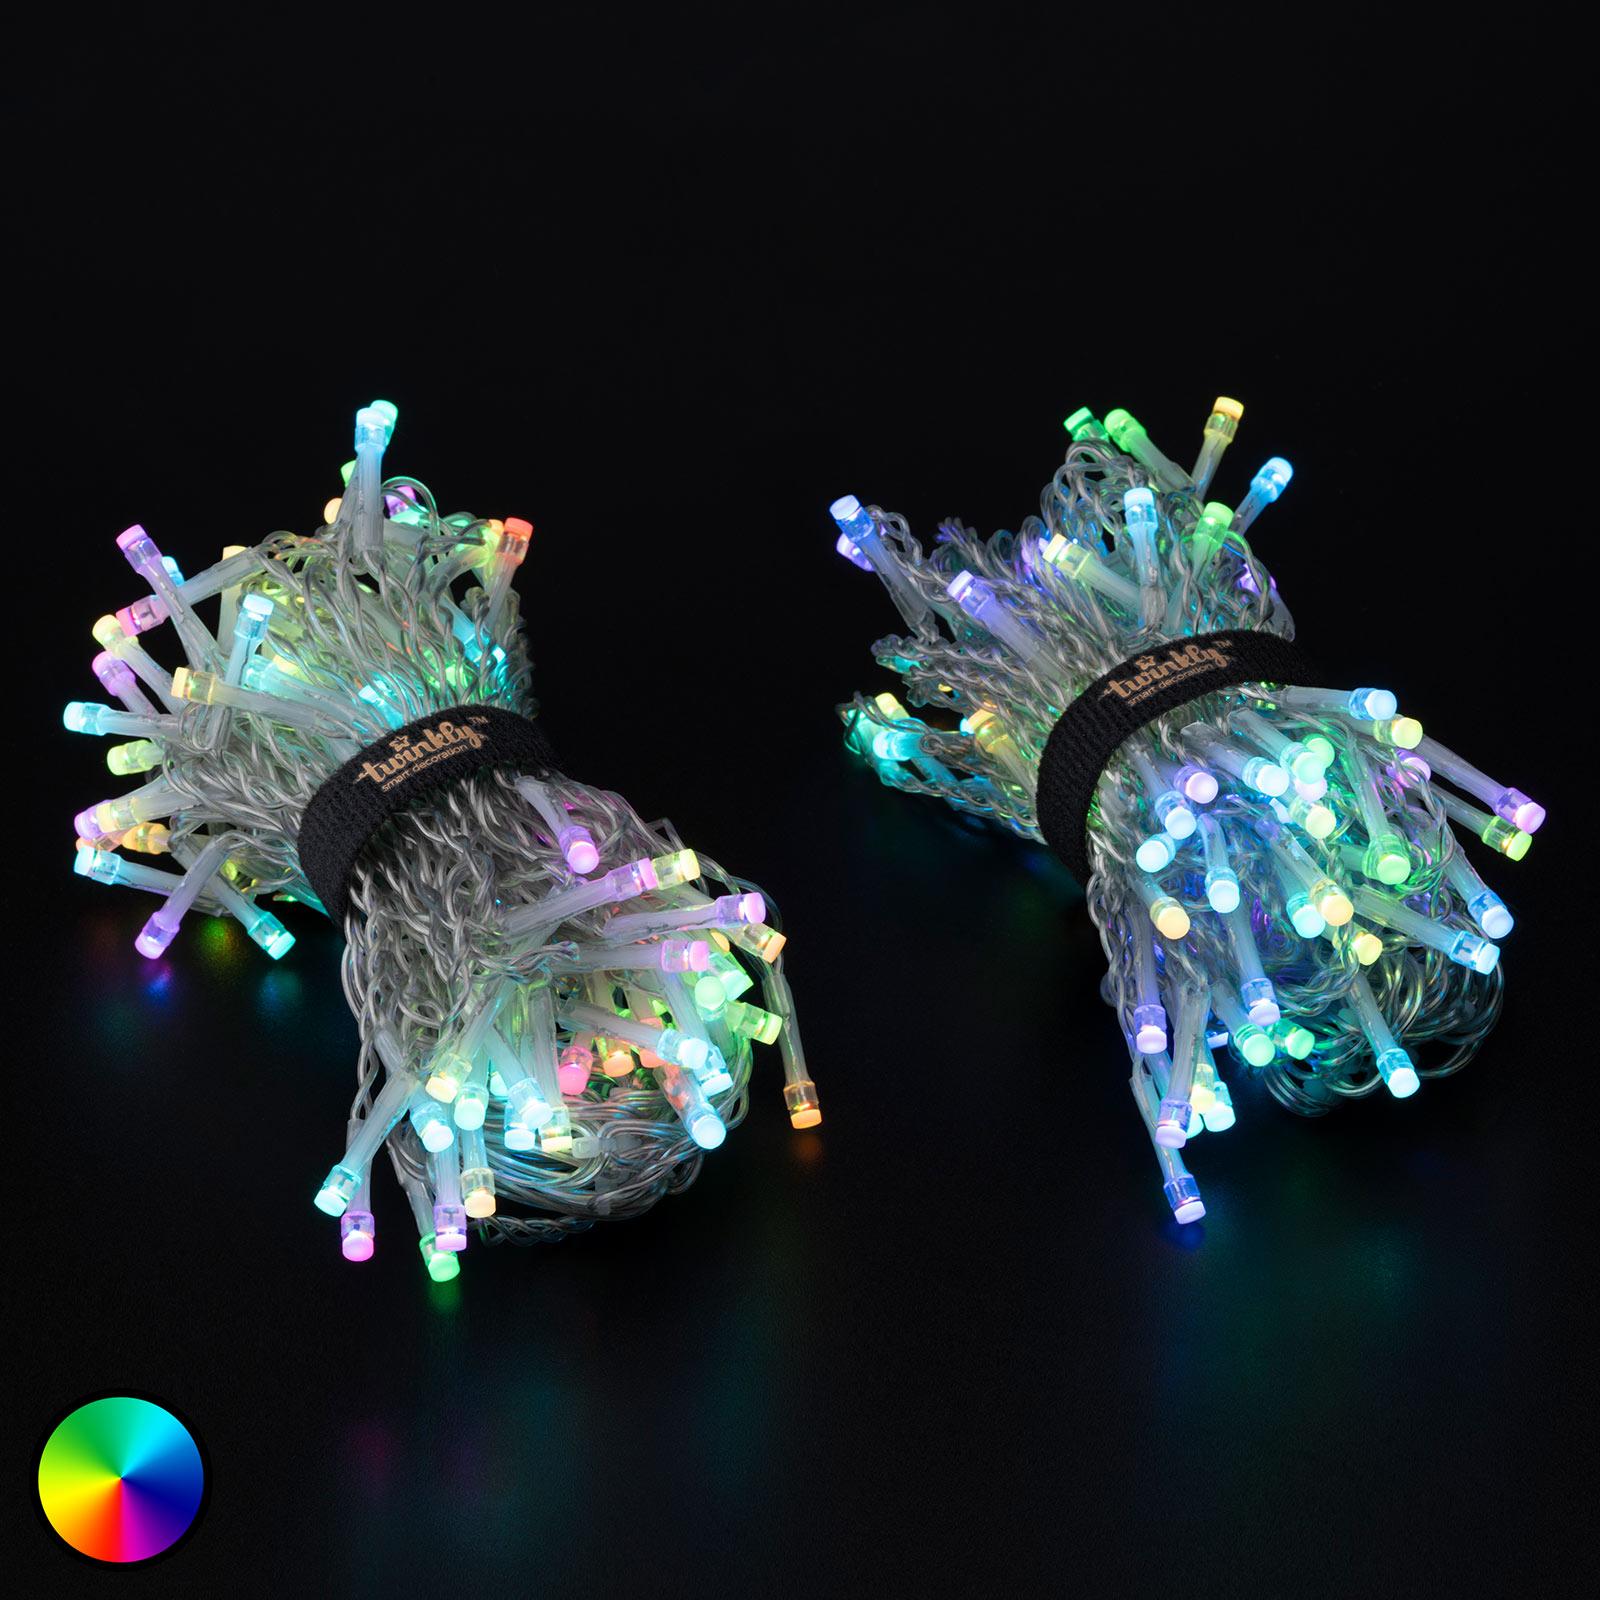 Cortina de luces LED Twinkly para app, RGB